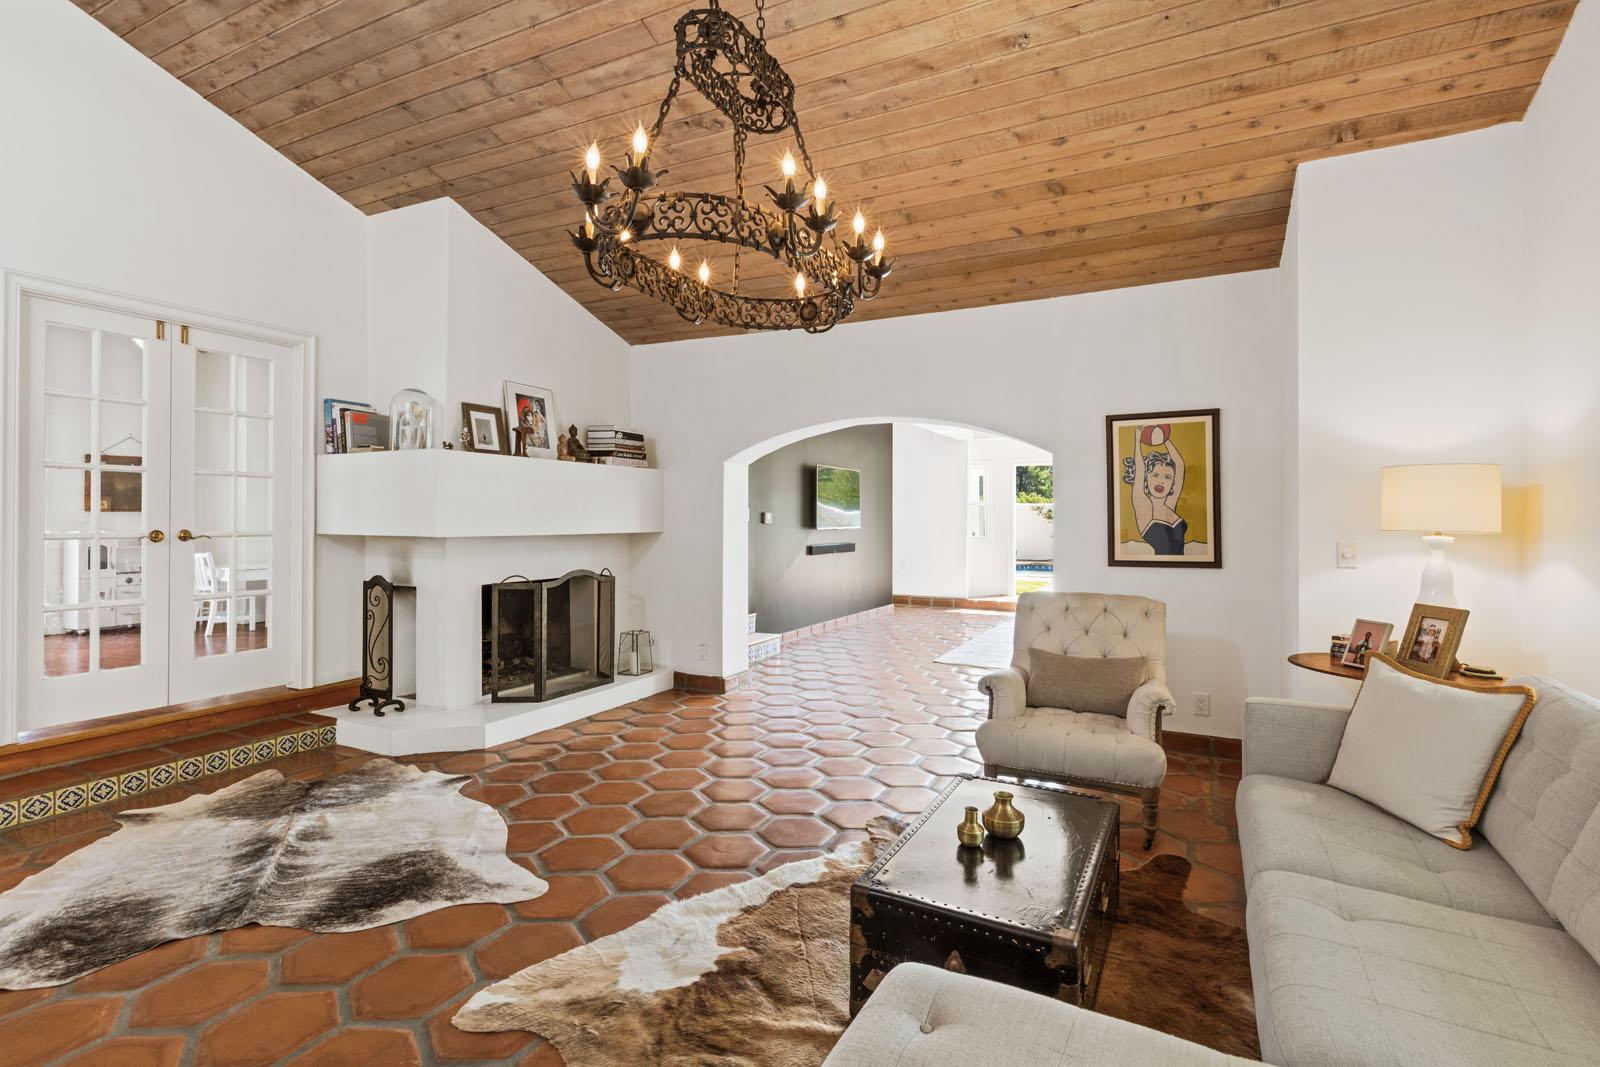 010 Living 1712 Manzanita Park Avenue Malibu For Sale Lease The Malibu Life Team Luxury Real Estate.jpg